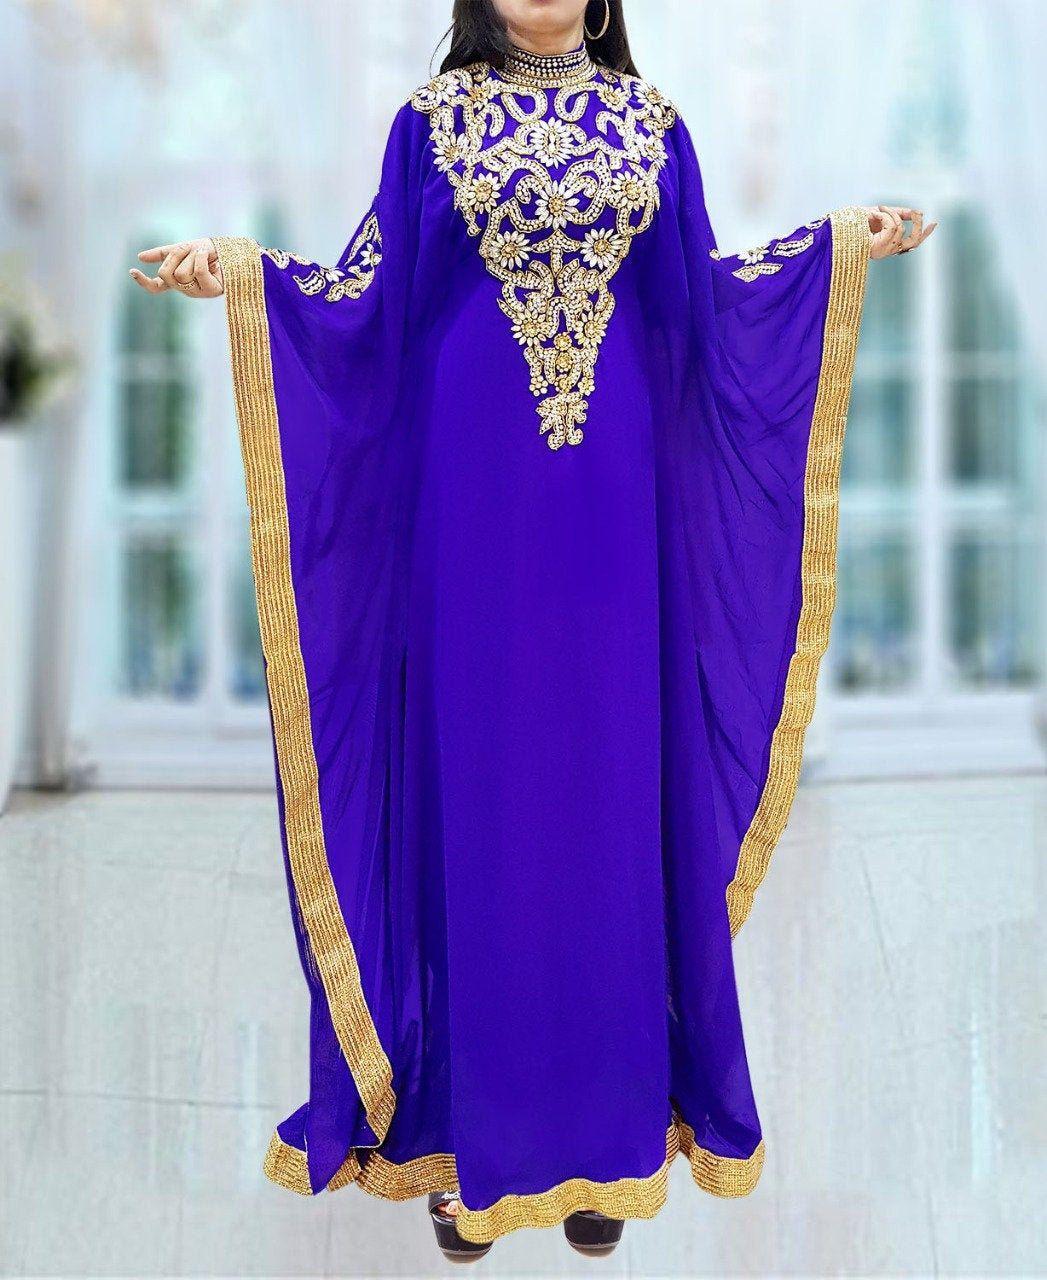 Moroccan Robe Traditional Sale New Kaftan Dresses for Women Caftan Farasha Abaya Maxi Long Sleeve Formal Maxi Gown Evening African Dress